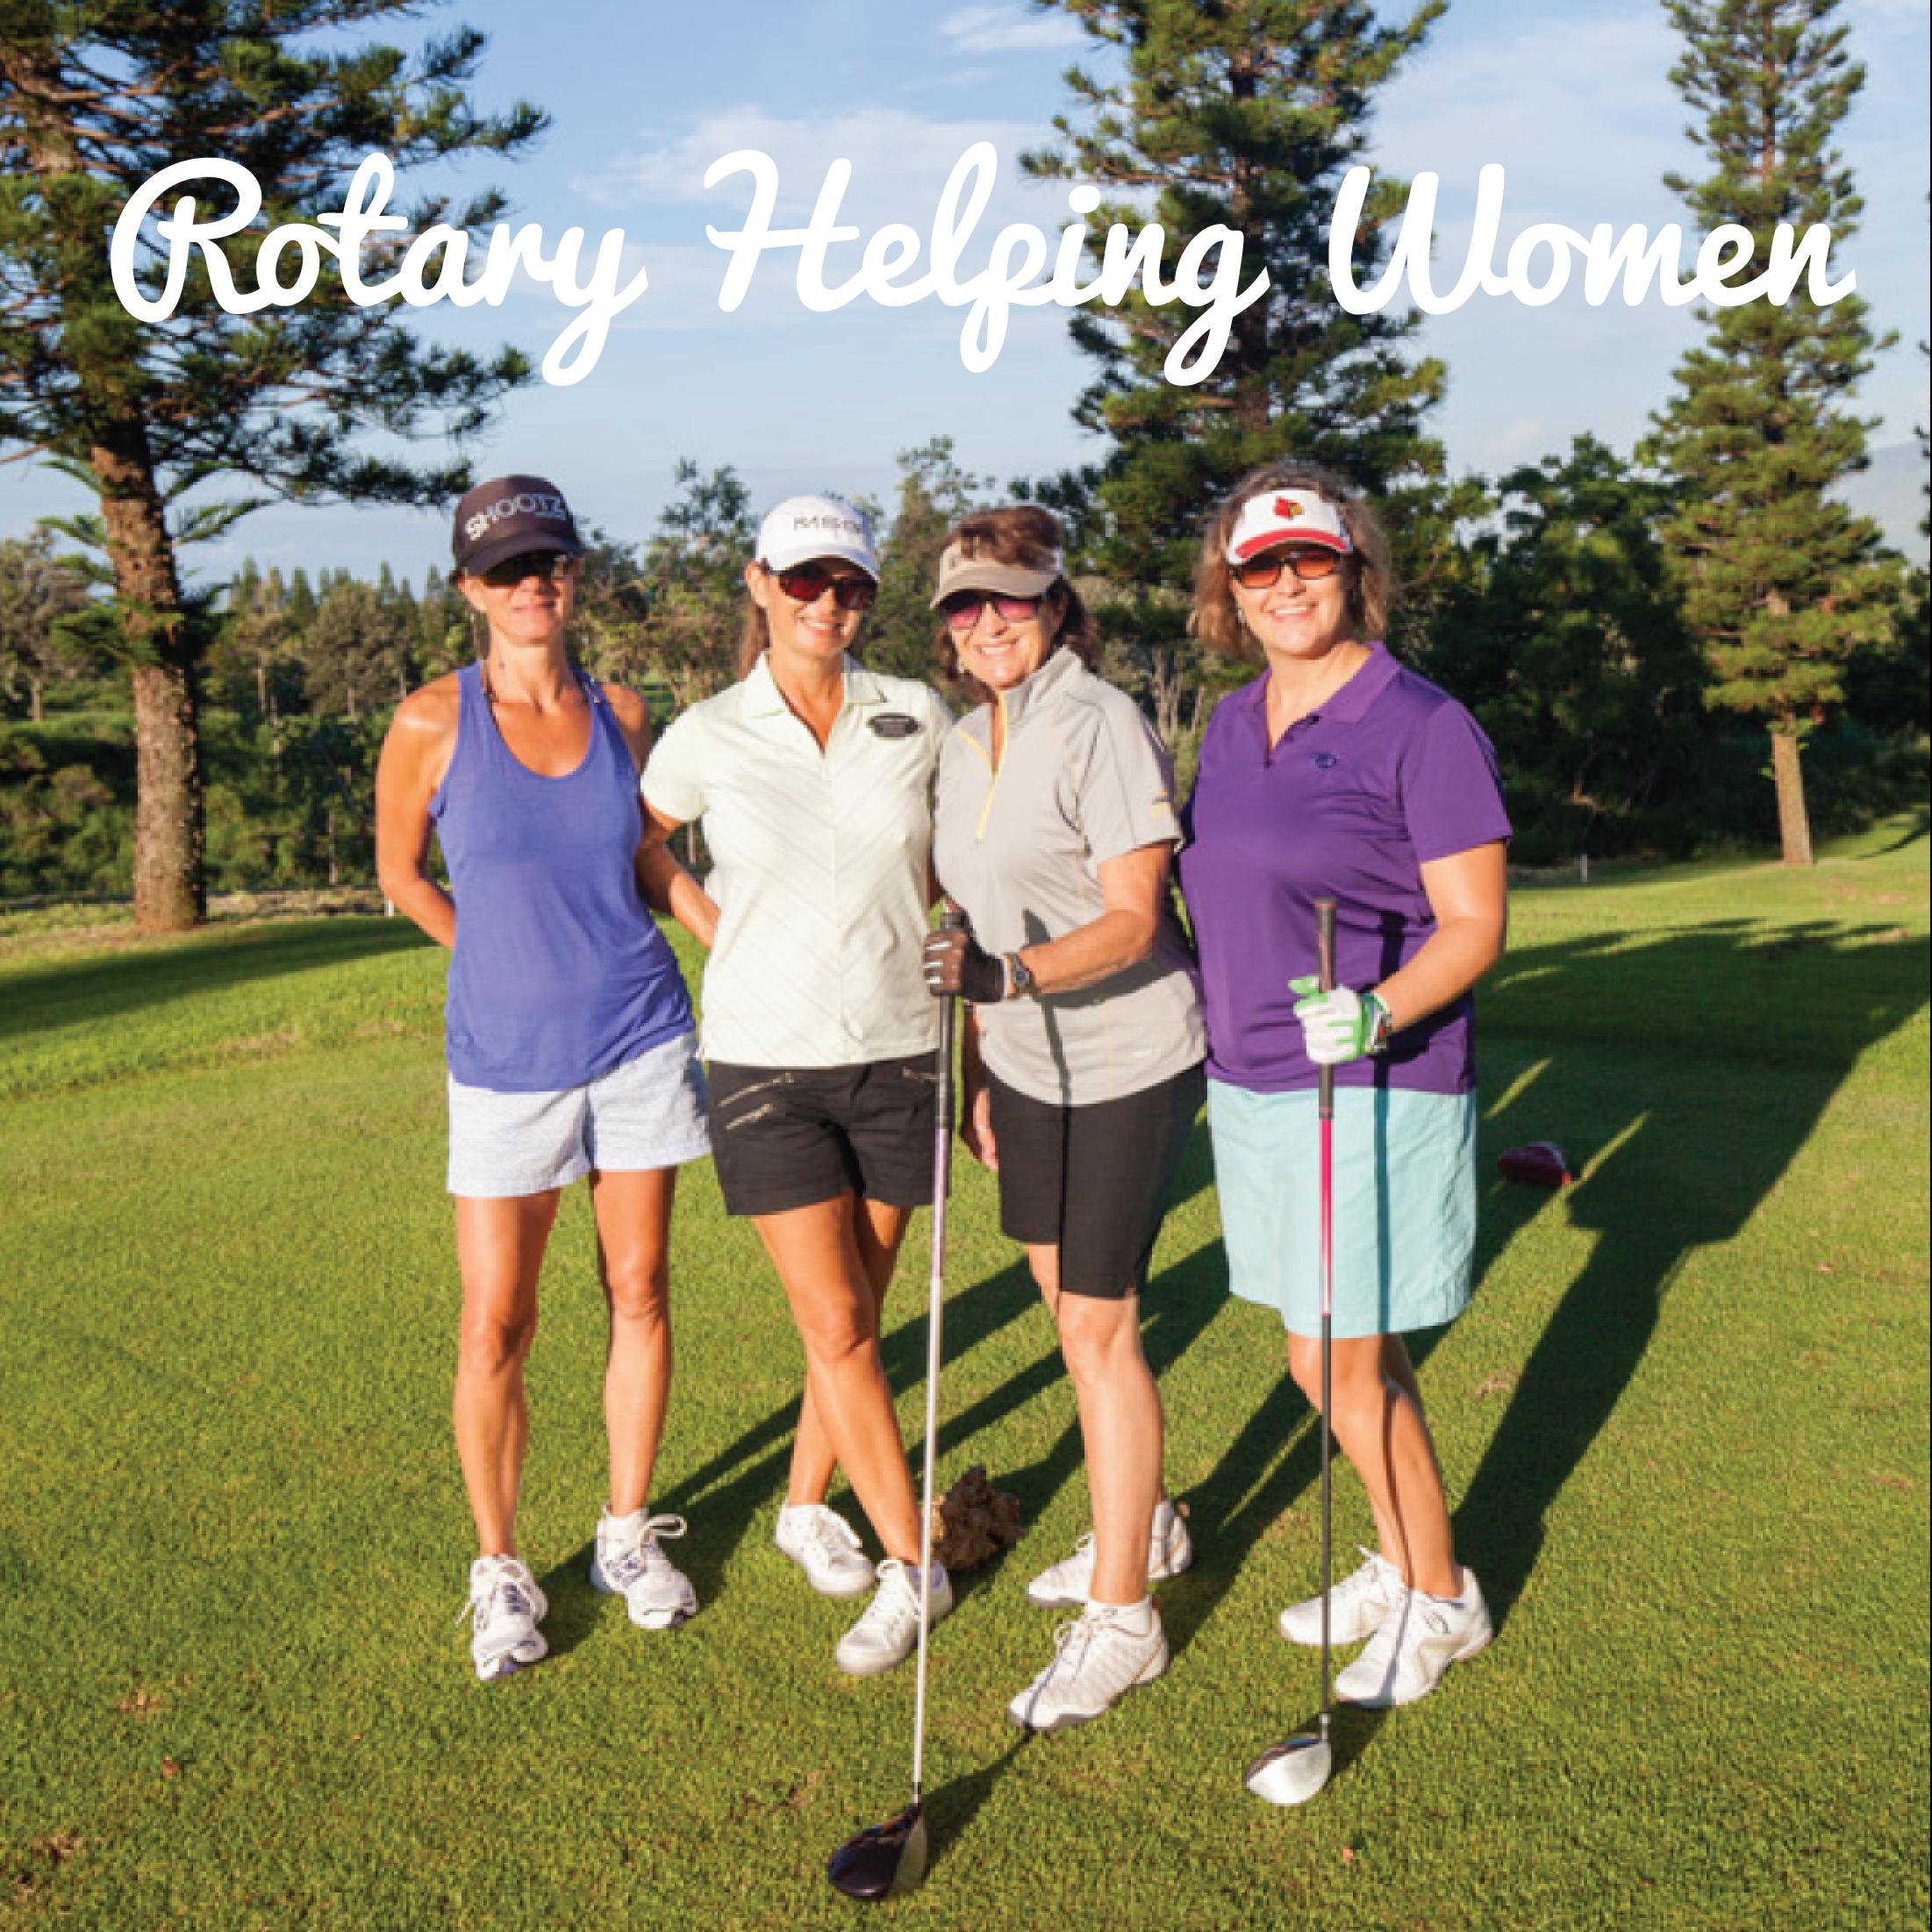 Rotary Helping Women Golf Tournament 2021 gallery image #5